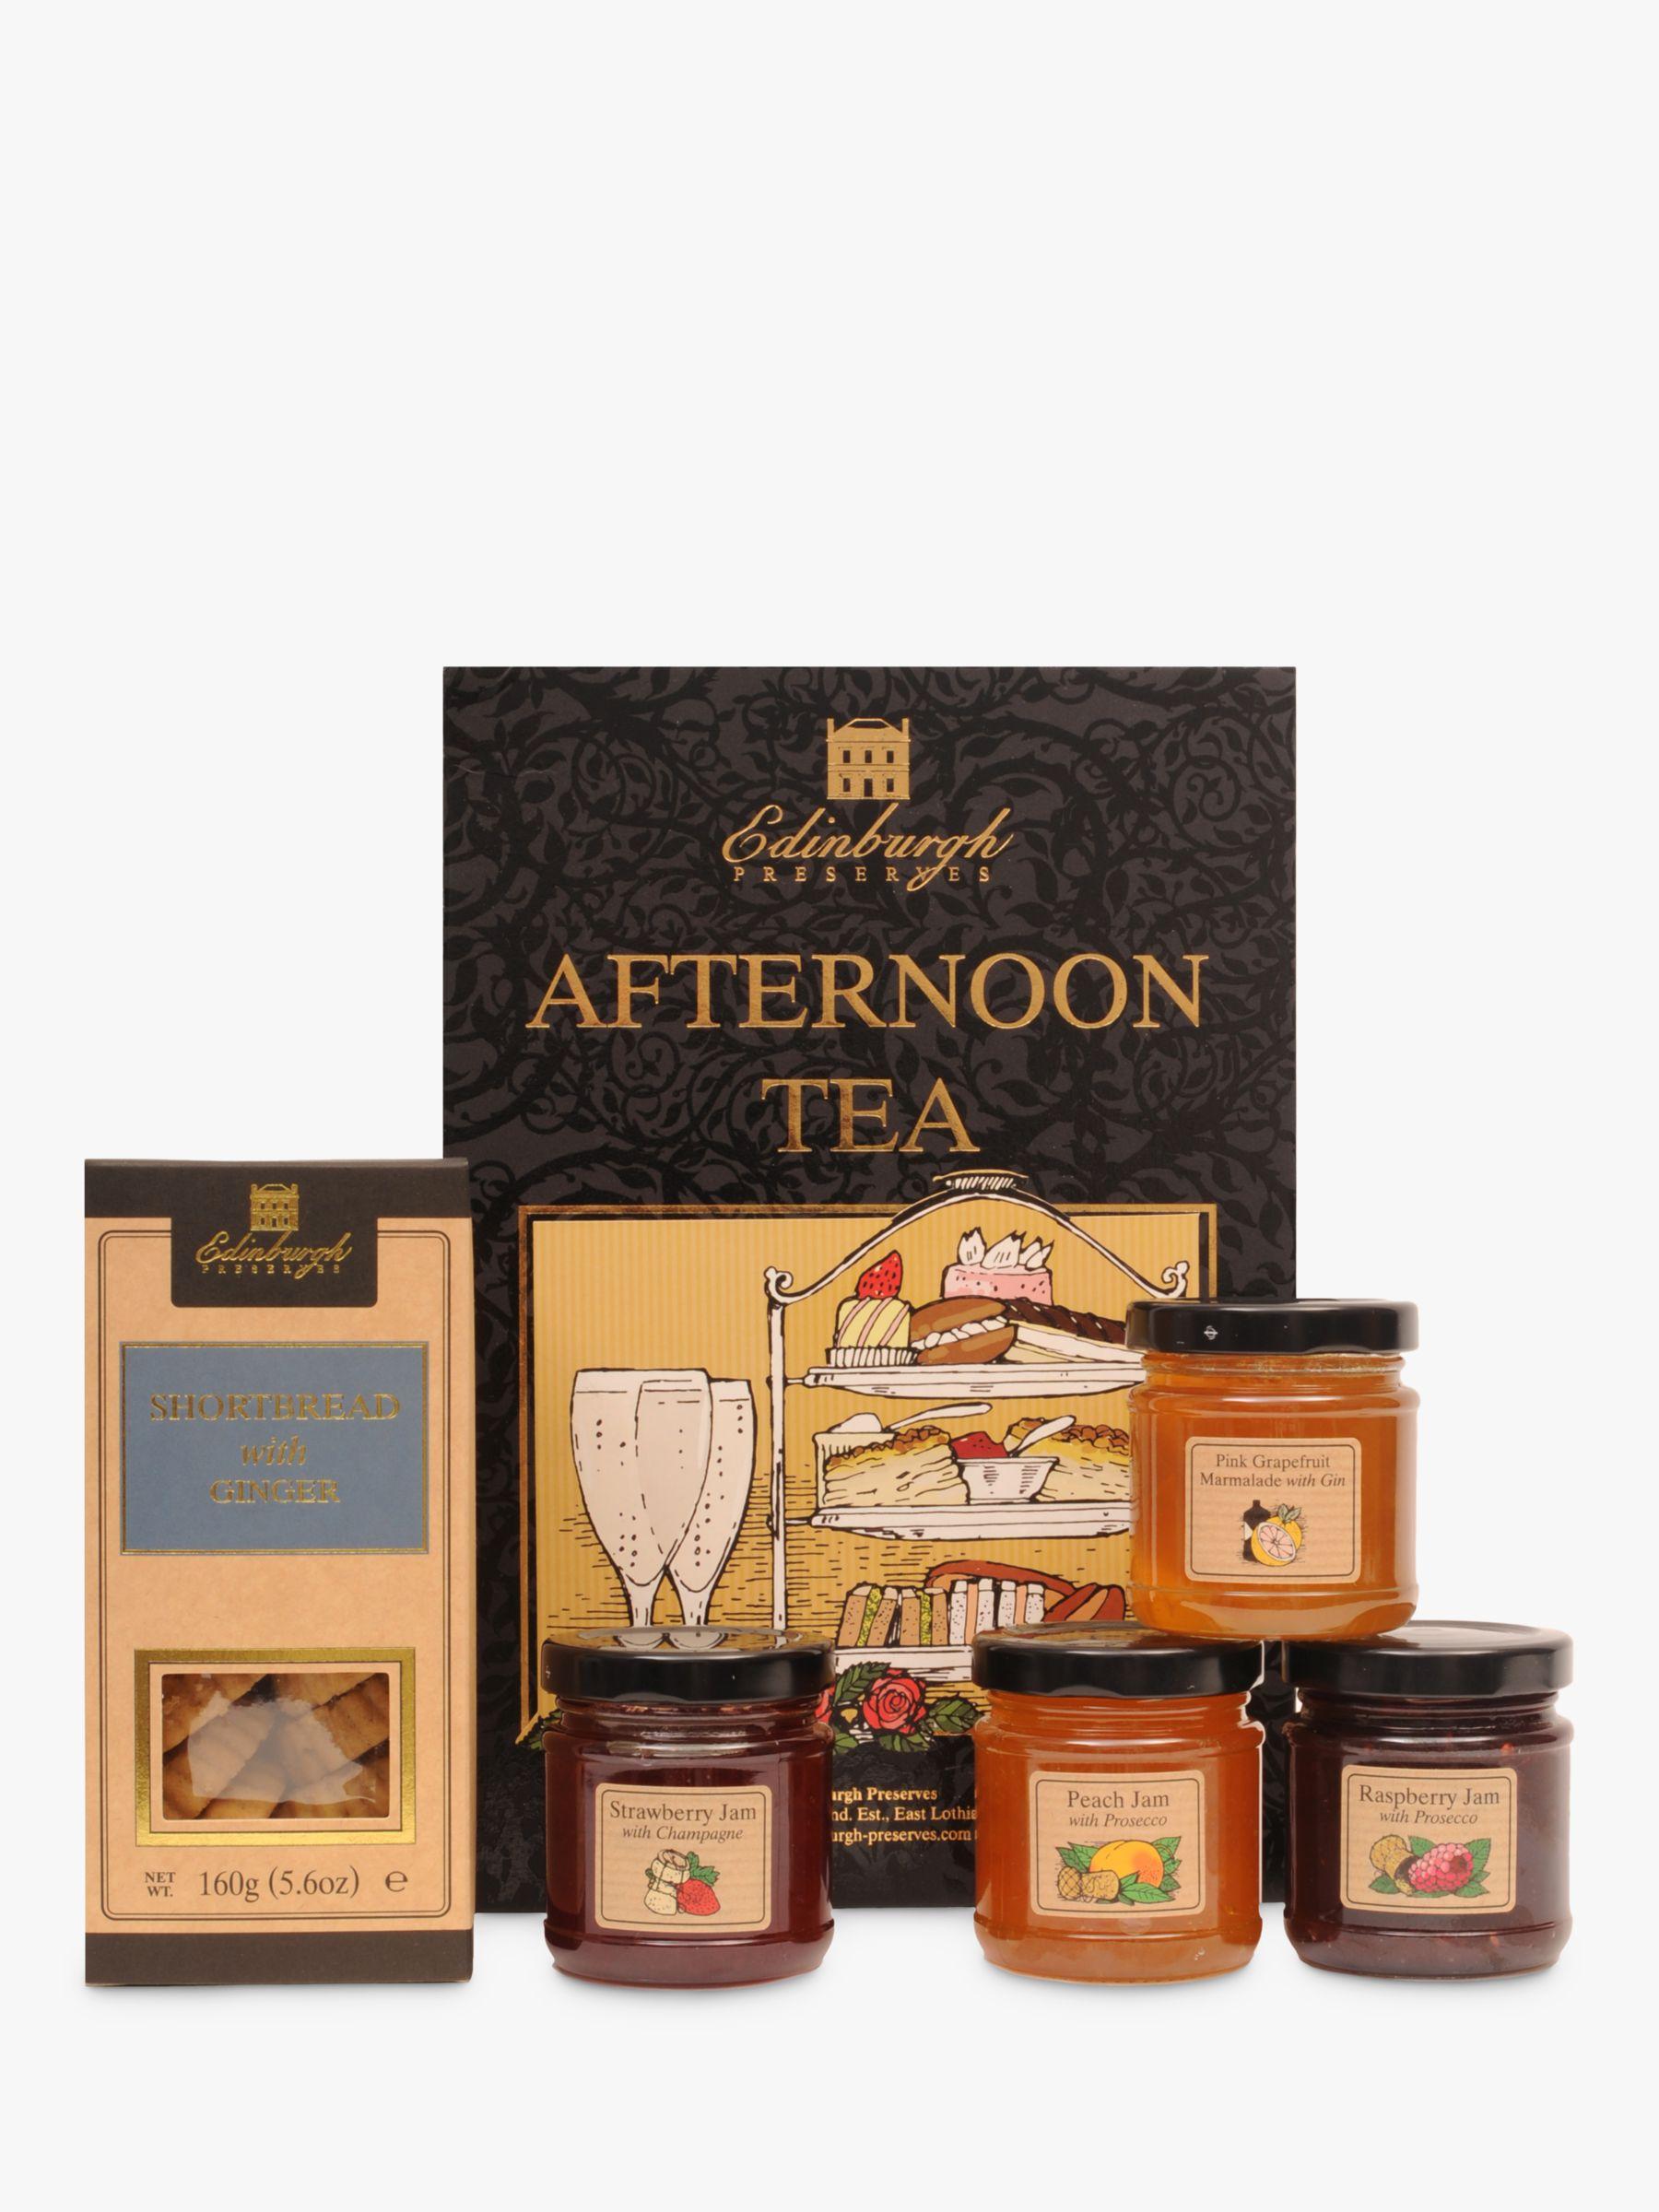 Edinburgh Preserves Edinburgh Preserves Afternoon Tea Jam Fizz & Shortbread Gift Set, 612g